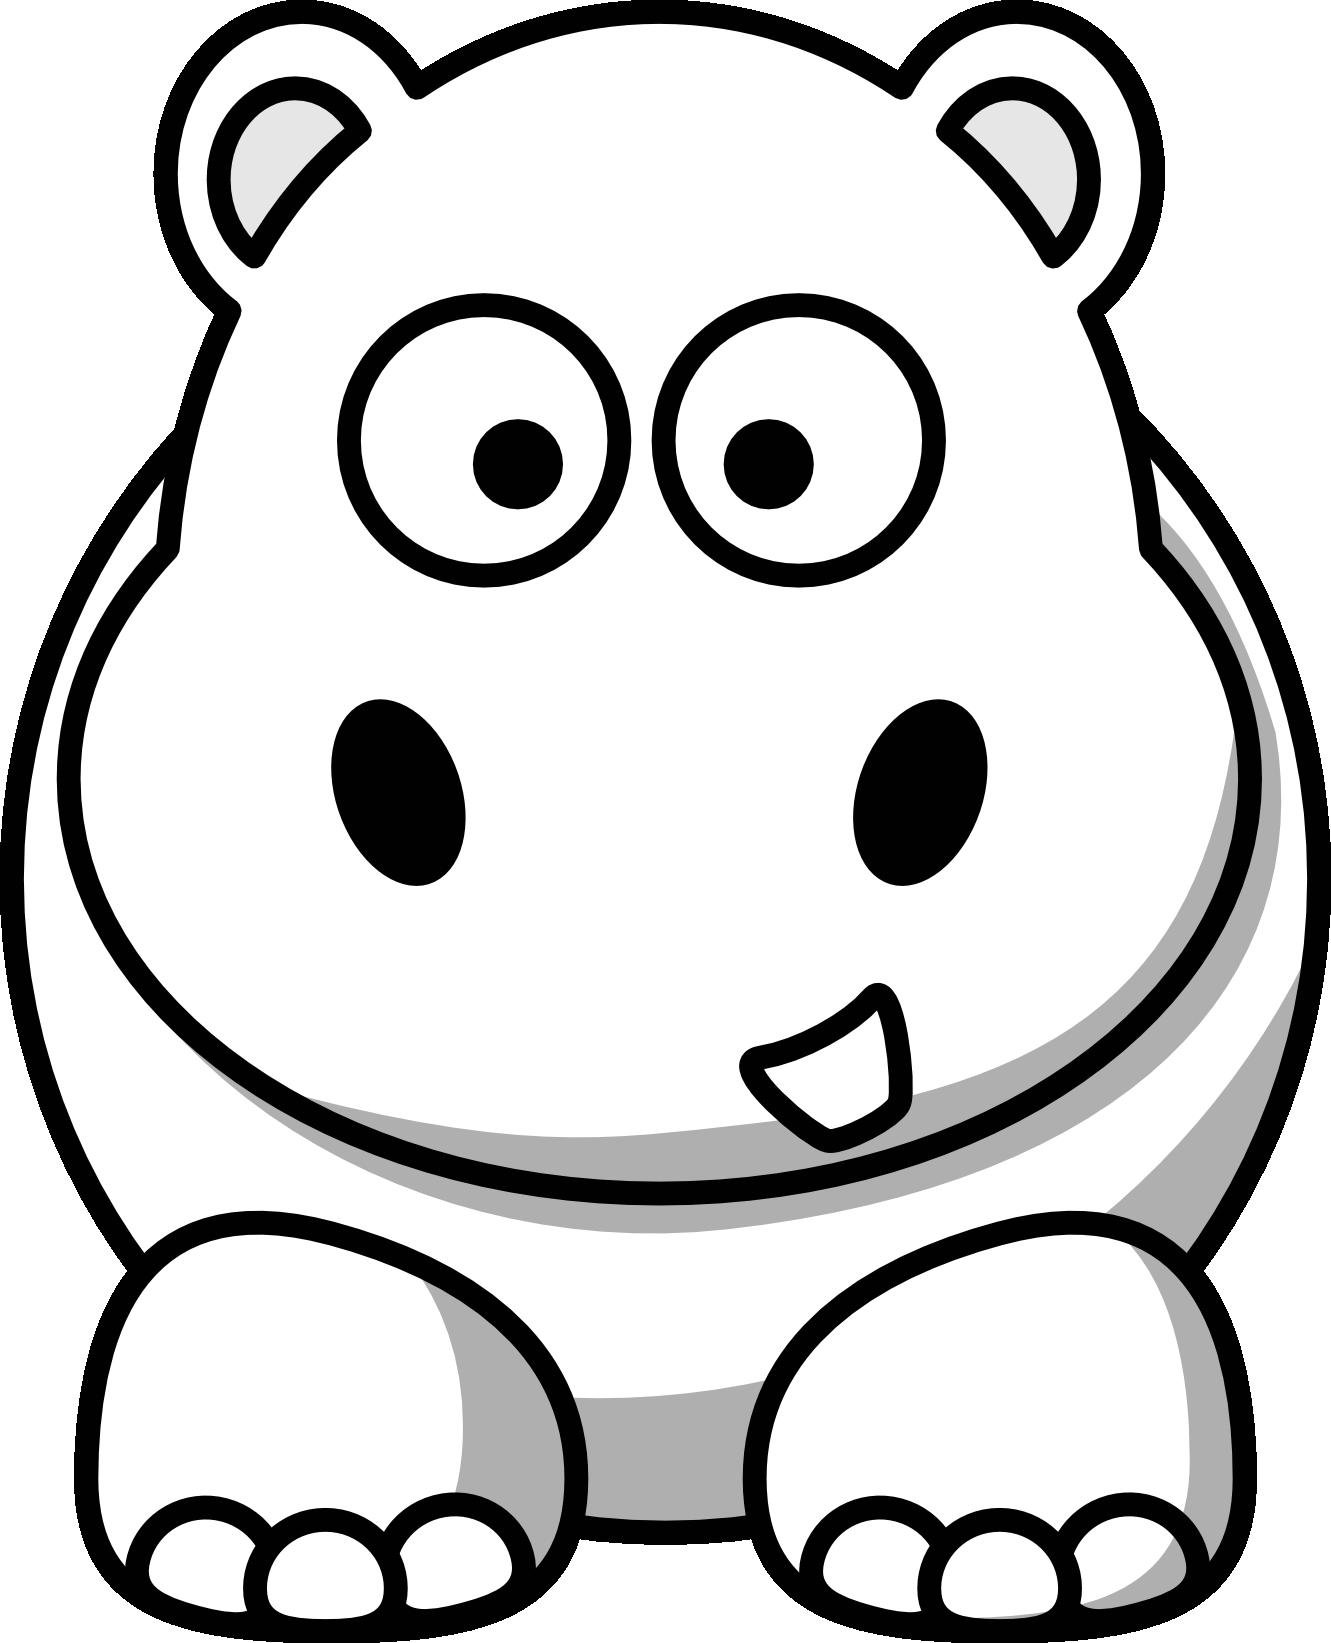 1331x1643 Top 91 Hippopotamus Clipart